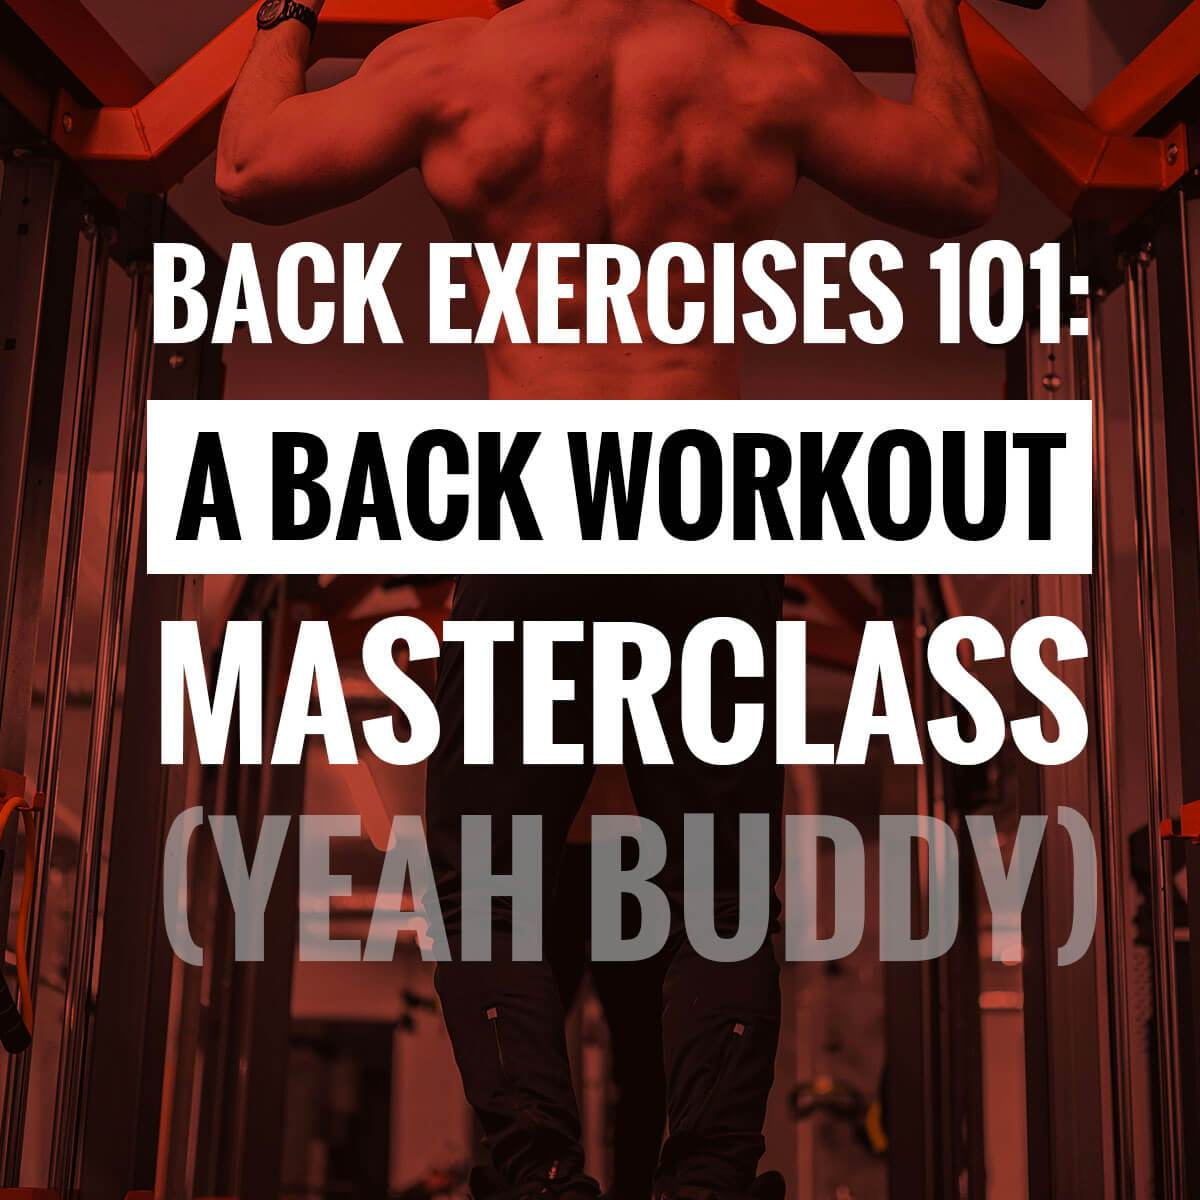 Back Exercises 101: A Back Workout Masterclass